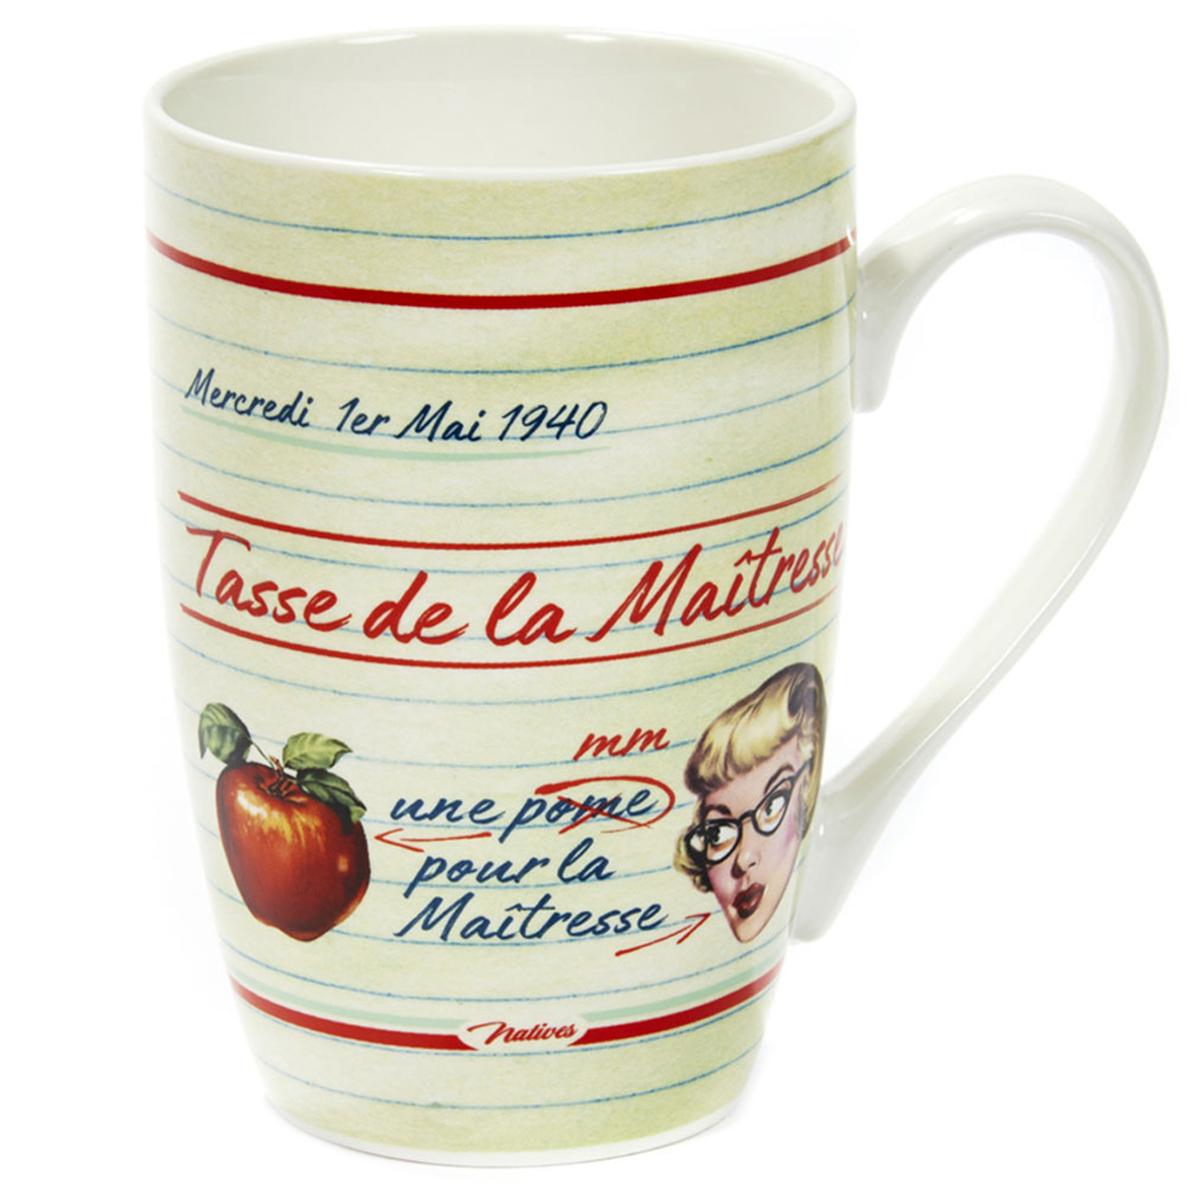 Grand mug porcelaine \'French Vintage\' (Tasse de ma Maîtresse) - 13x85 cm (46cl) - [Q6971]